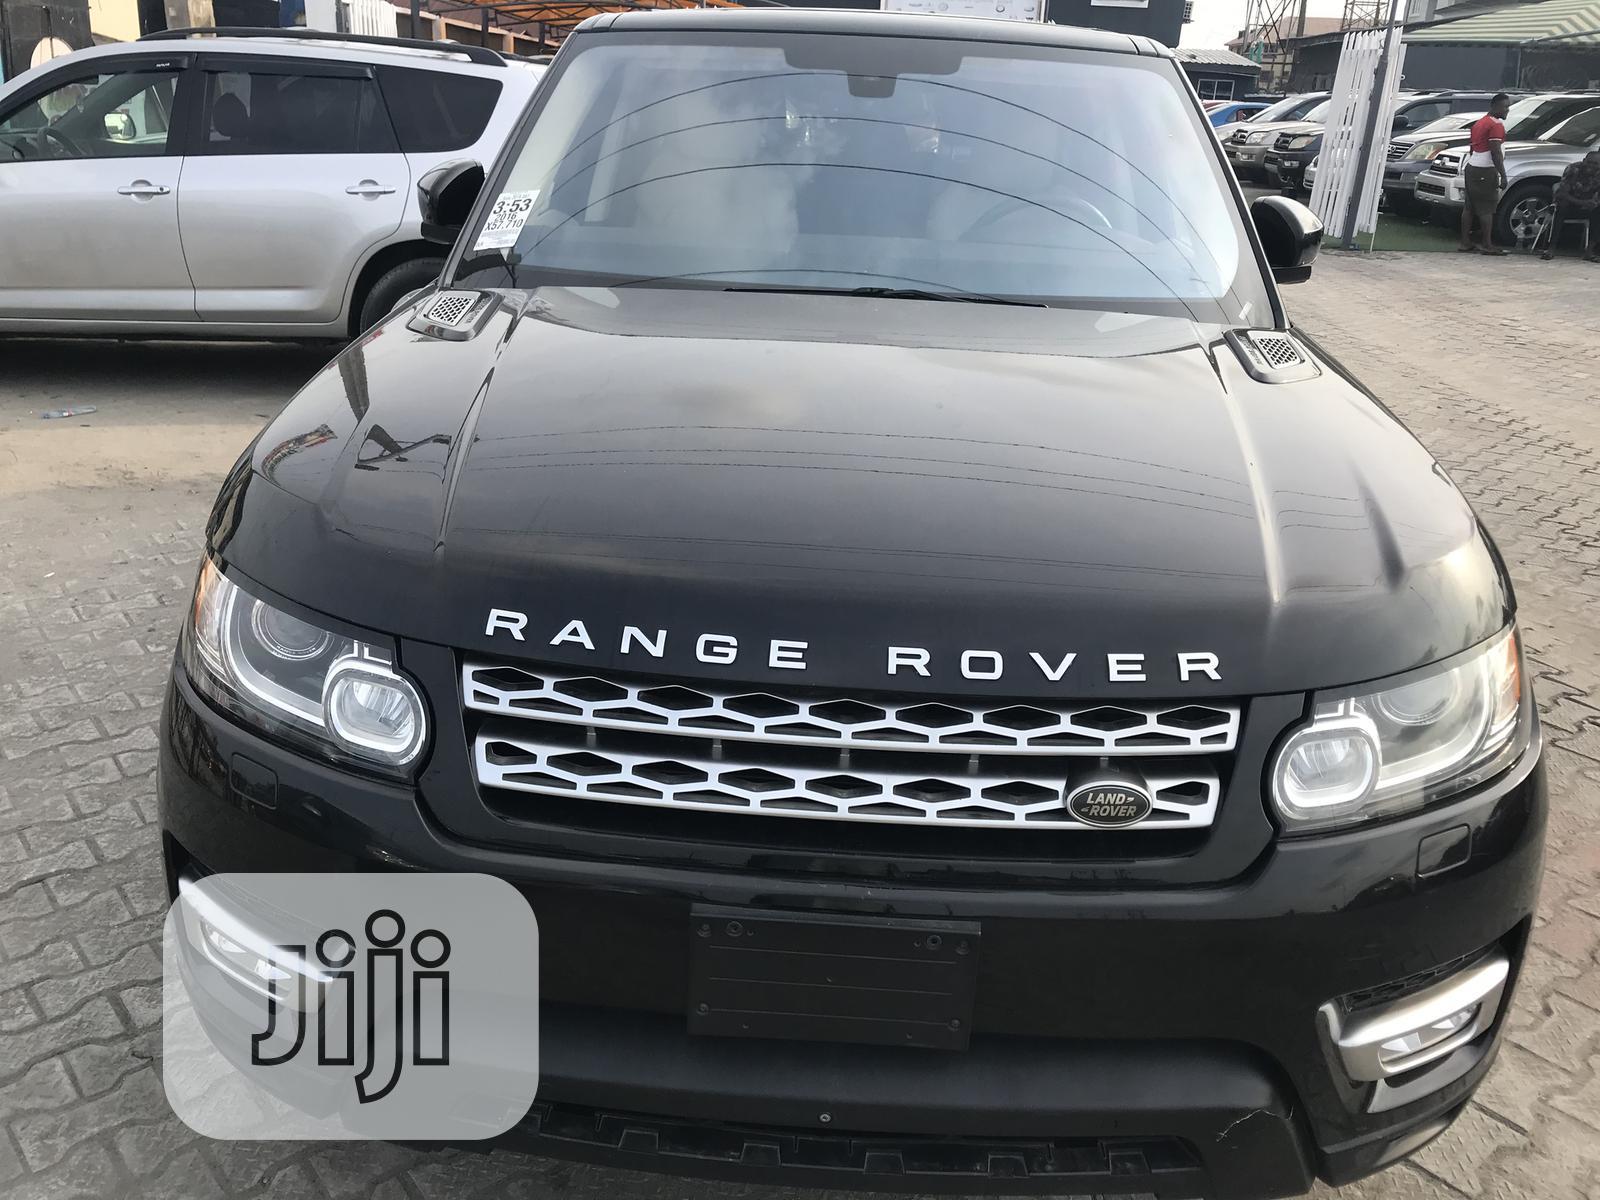 Land Rover Range Rover Sport 2016 SE 4x4 (3.0L 6cyl 8A) Black